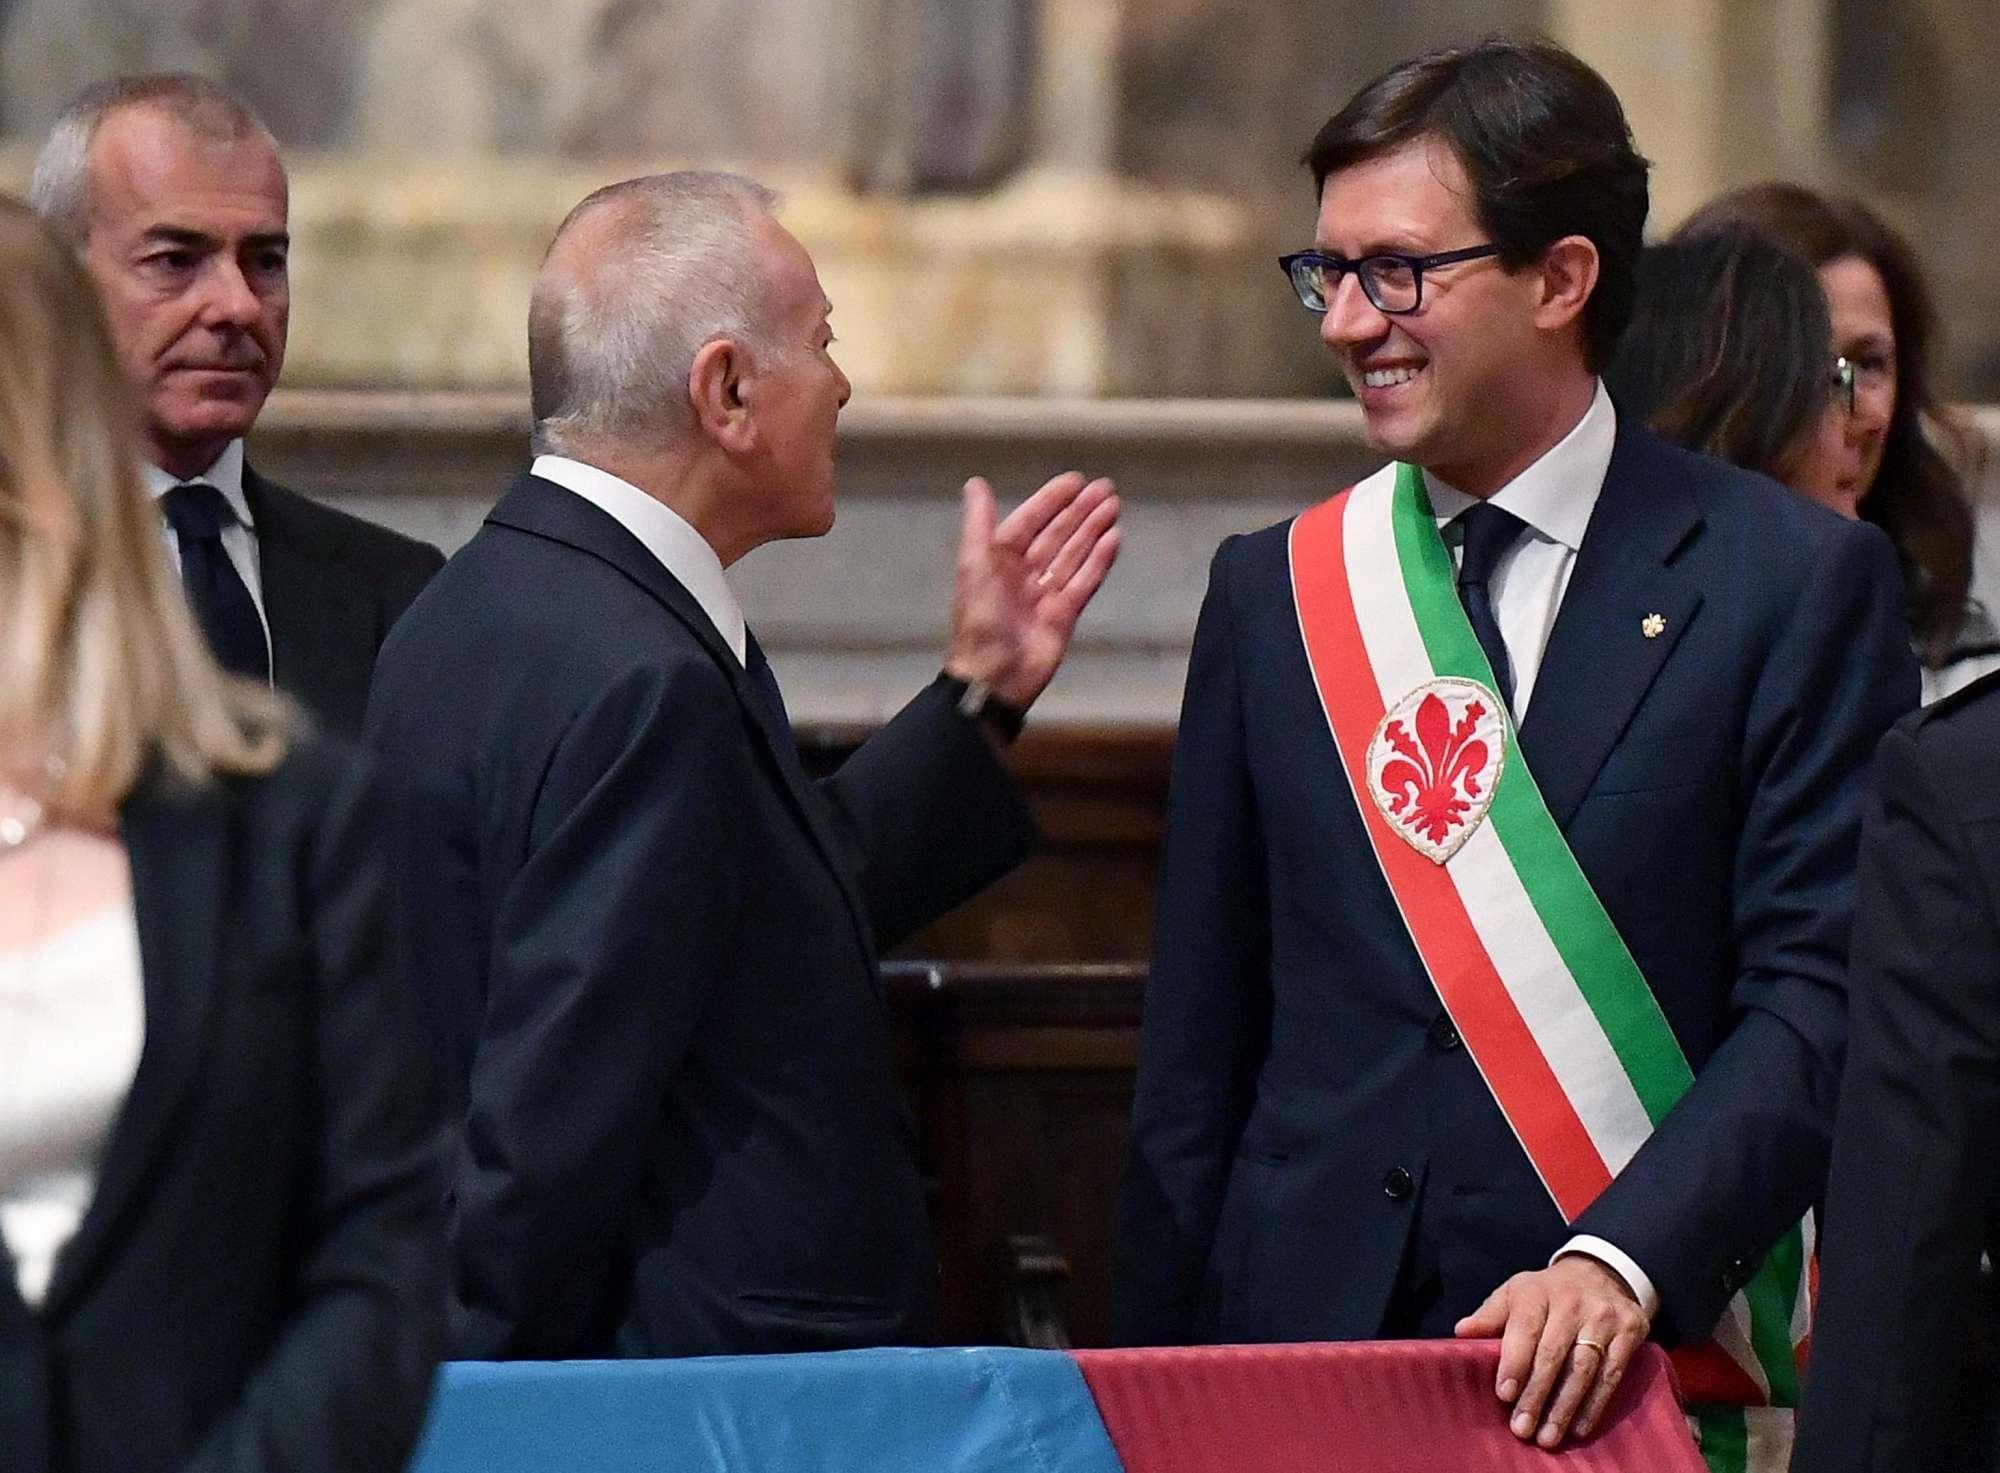 Franco Zeffirelli, folla ai funerali nella sua Firenze